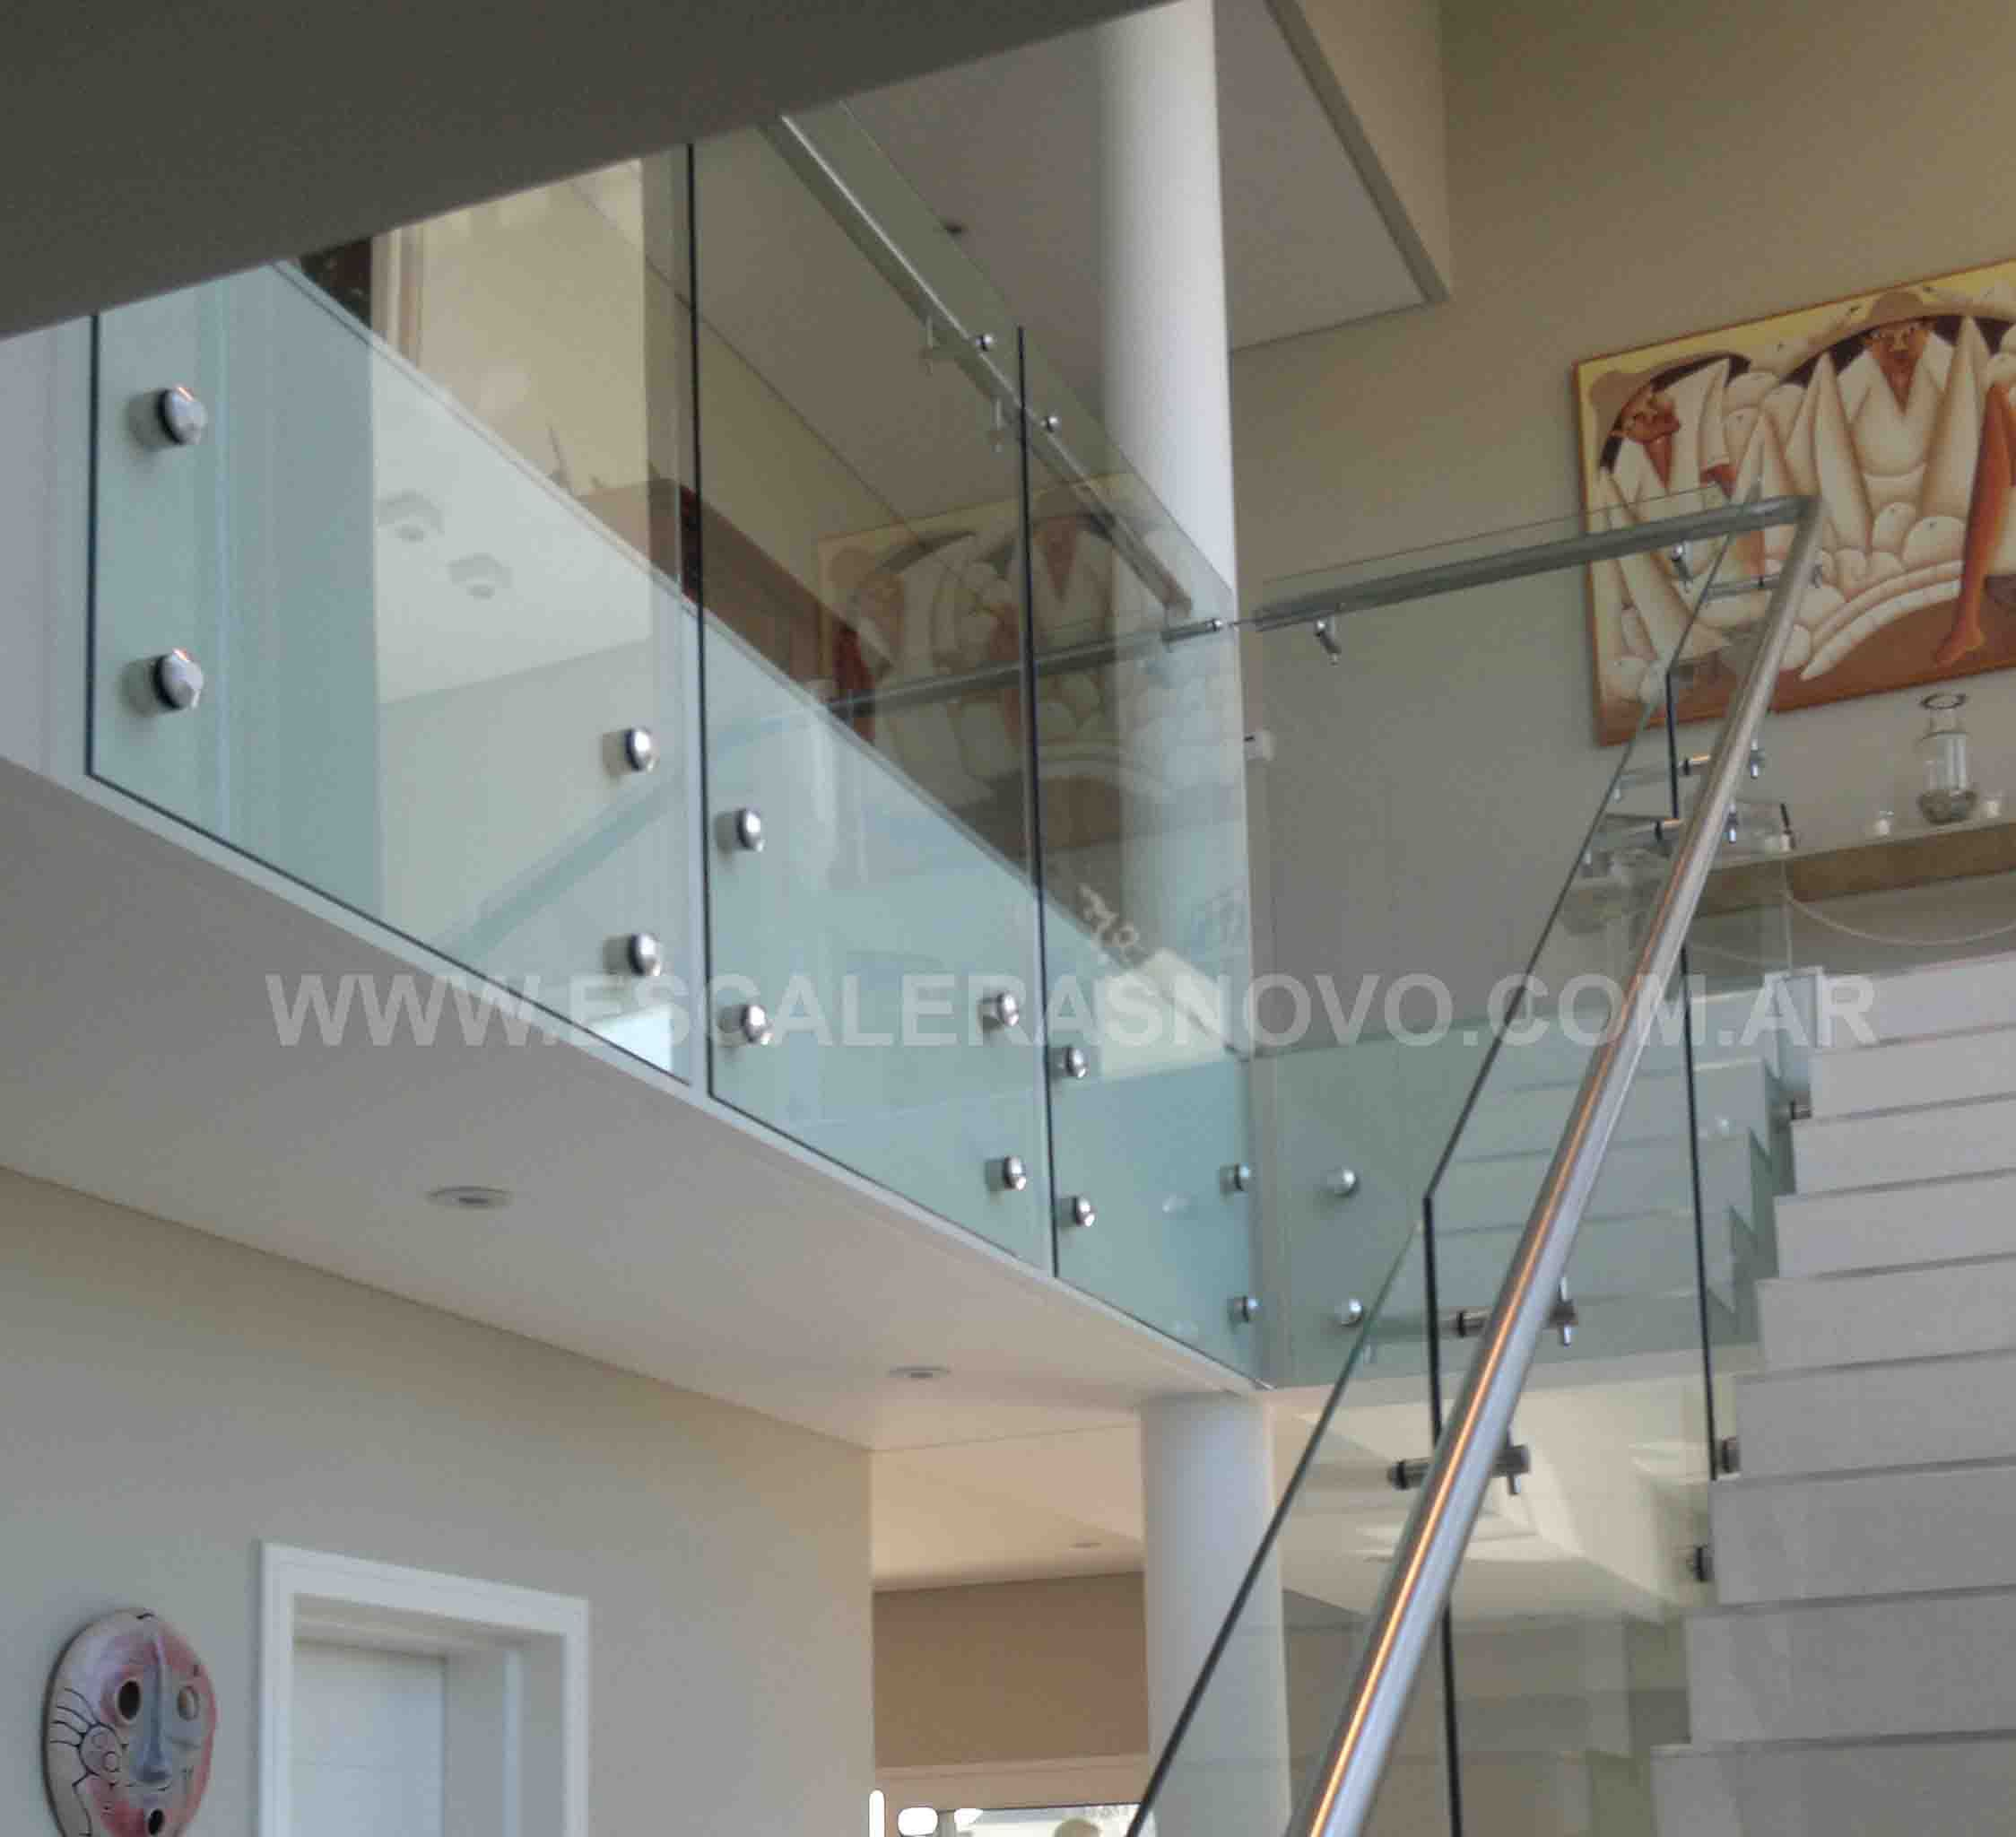 Resultado de imagen para escalera vidrio templado home for Barandas de escalera